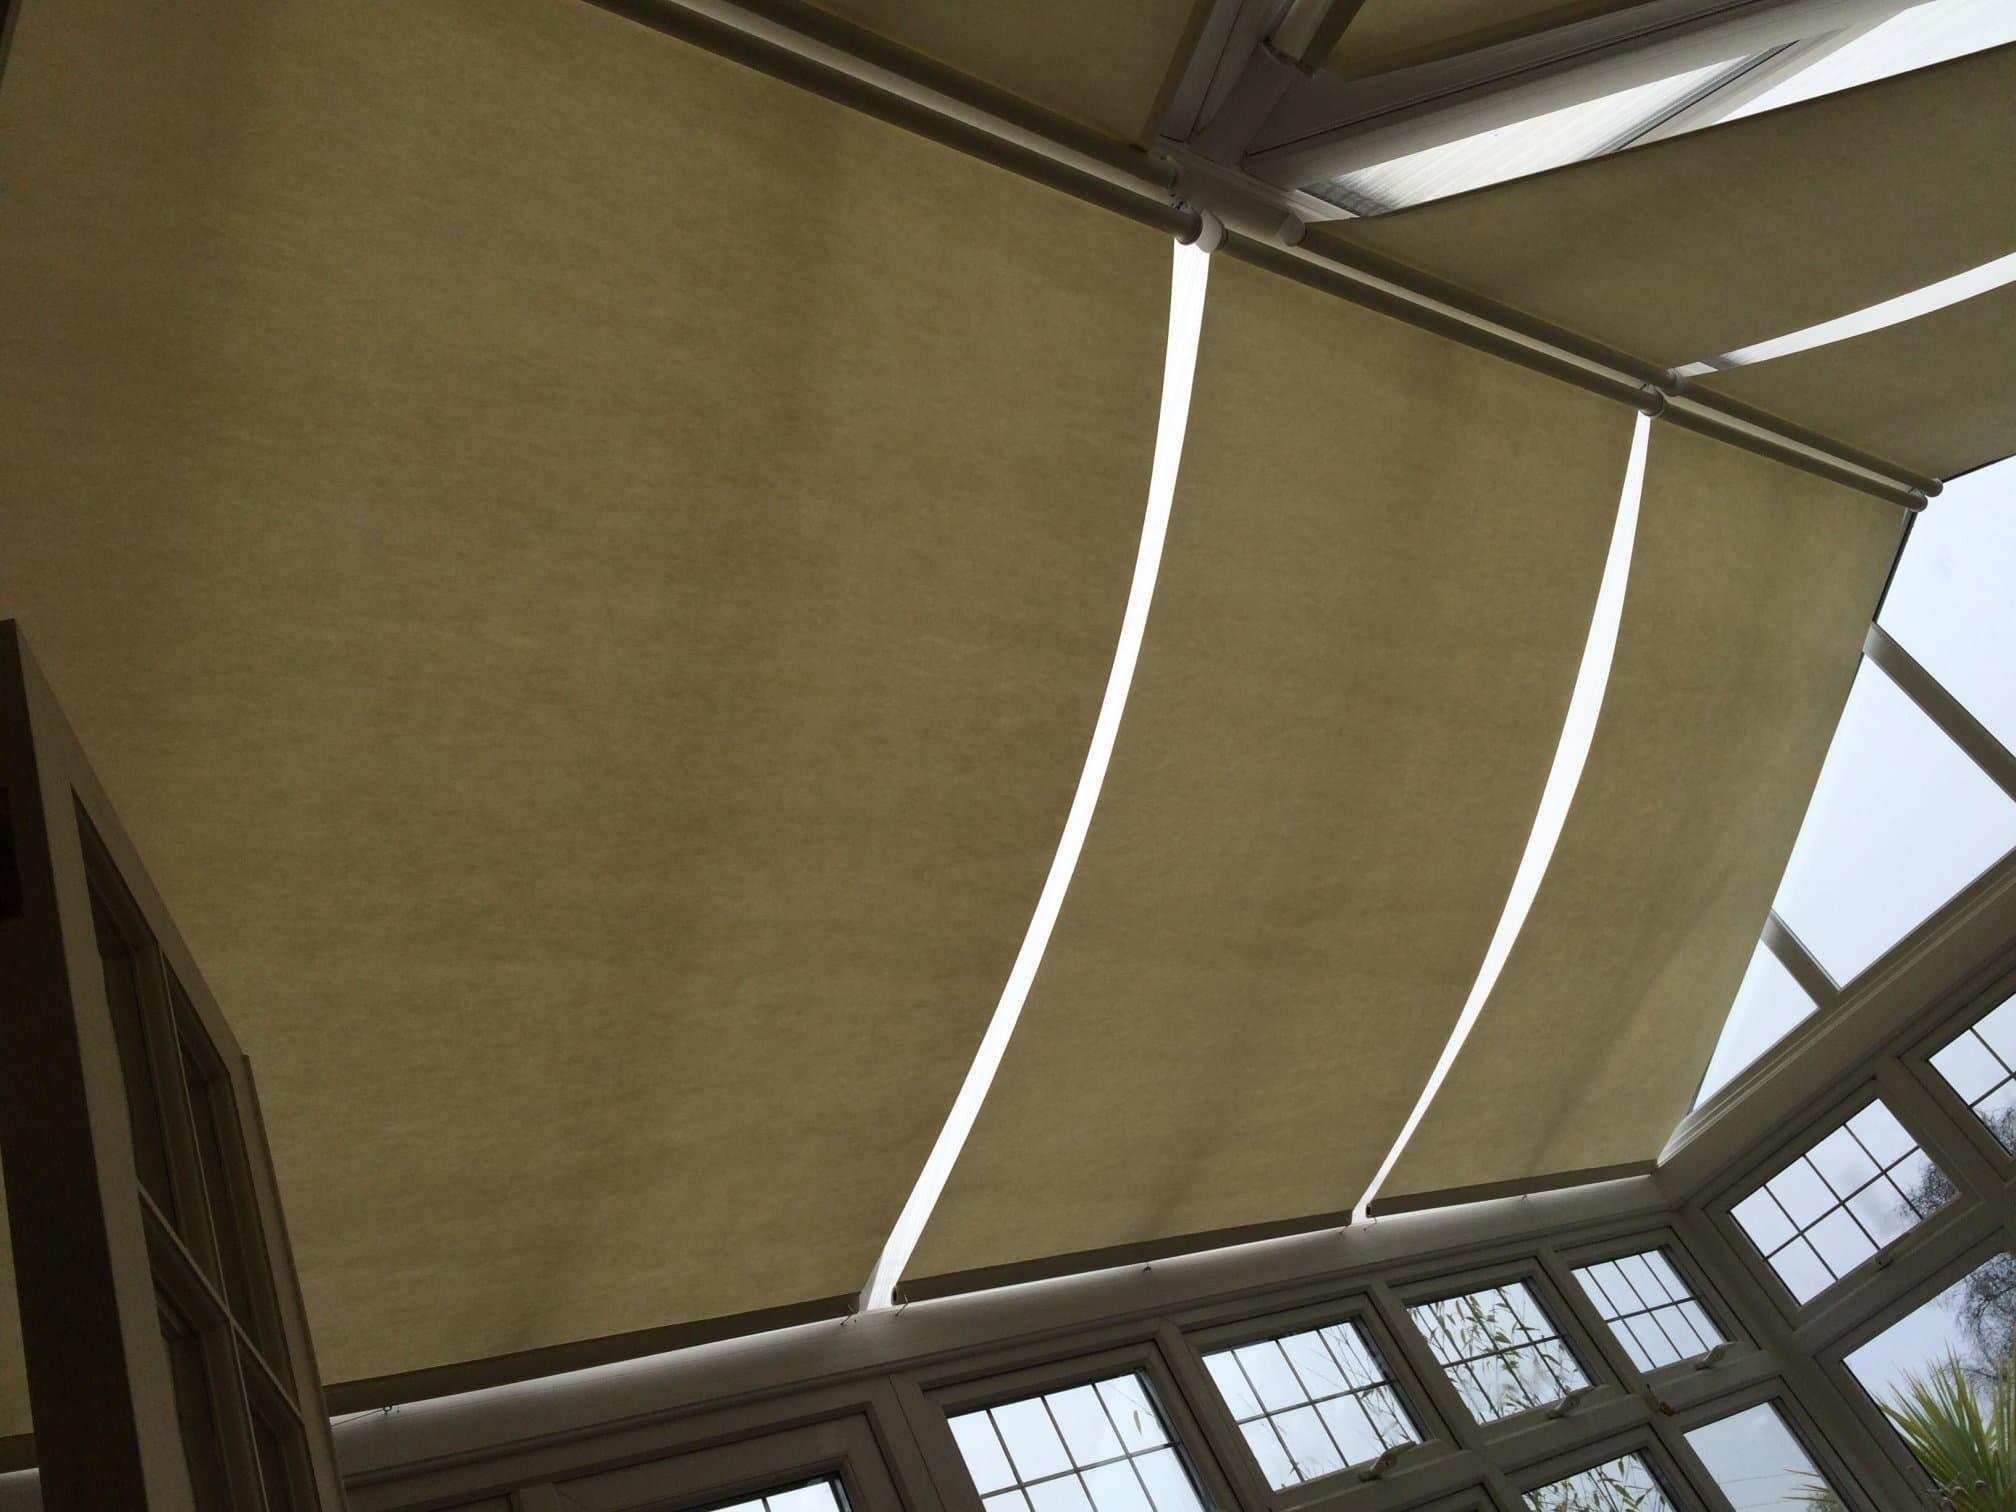 Twyford Blinds & Curtains